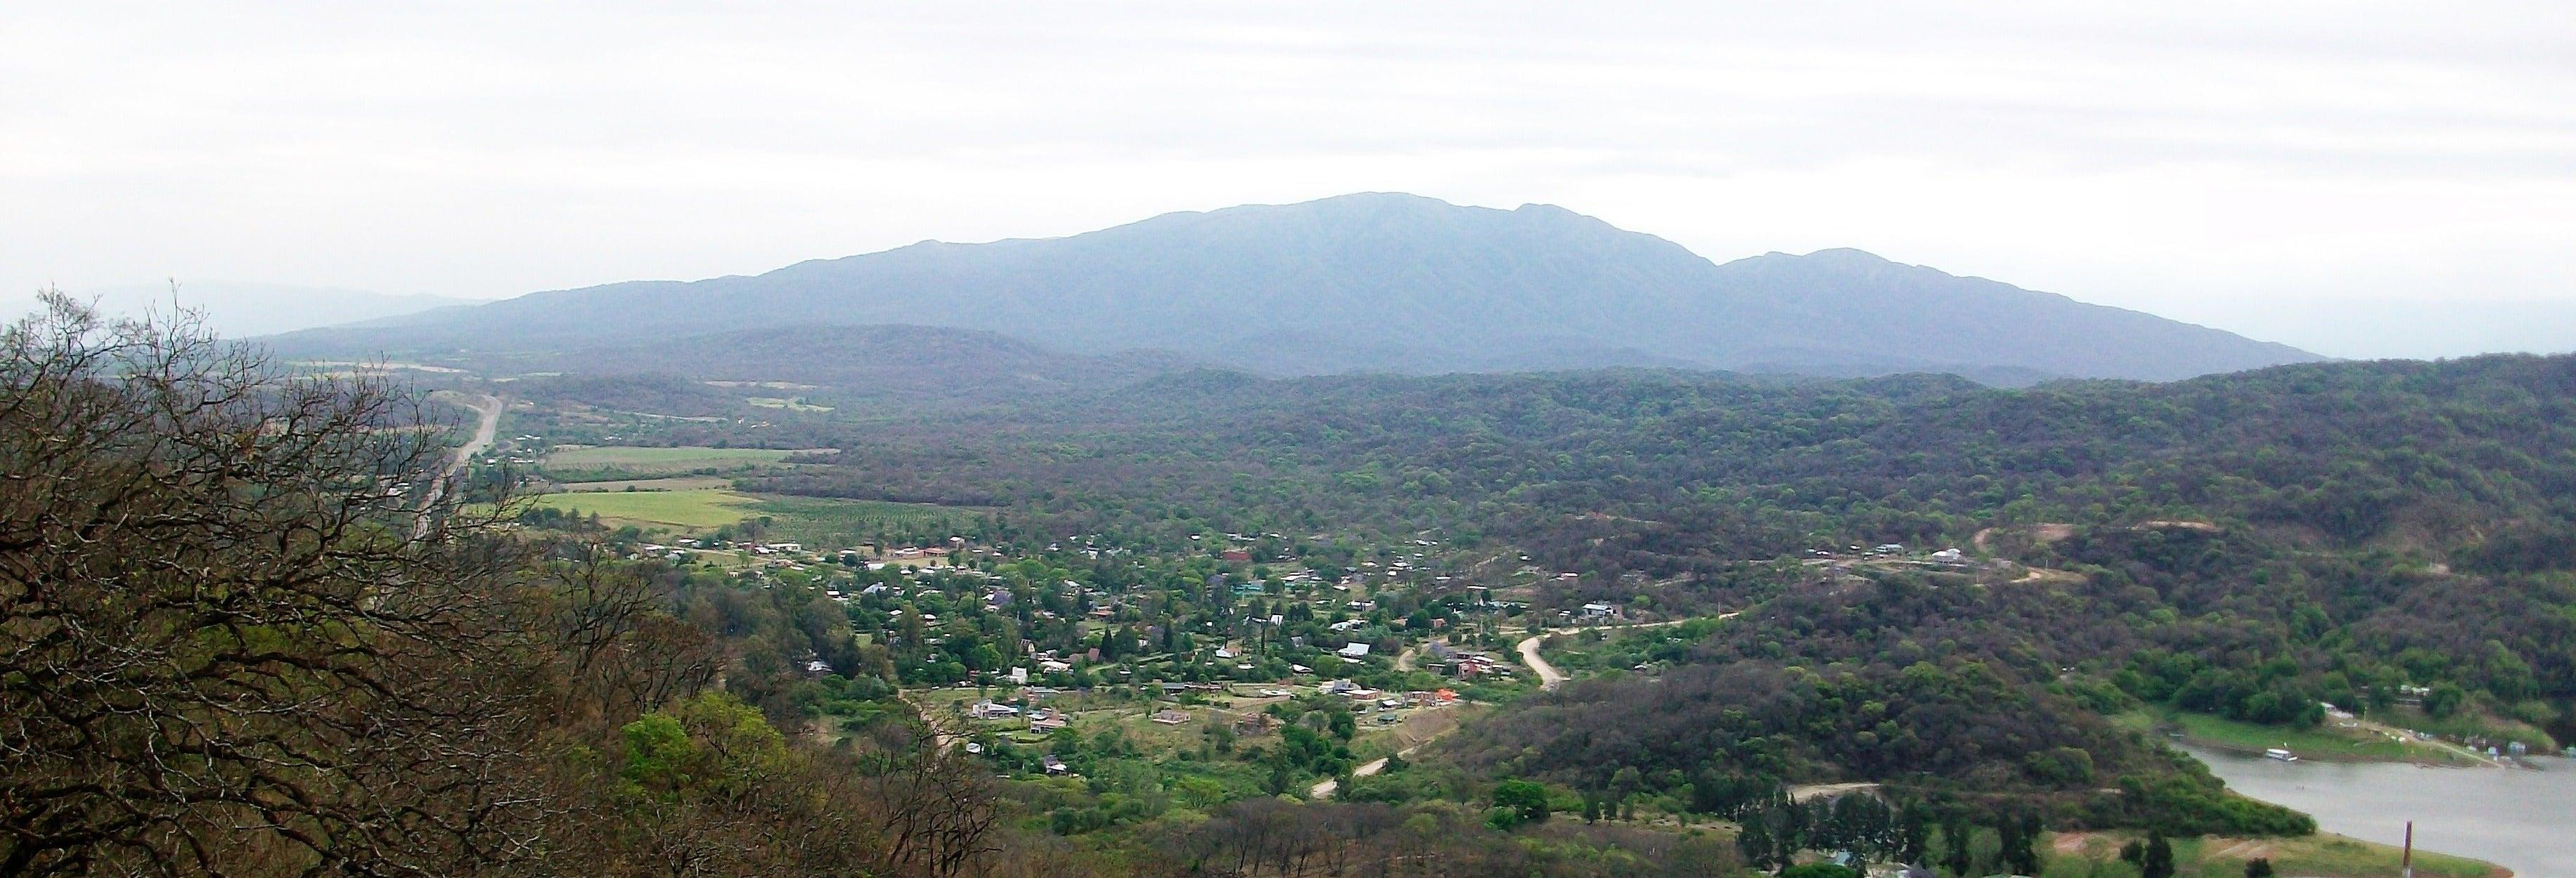 Excursion à San Pedro de Colalao